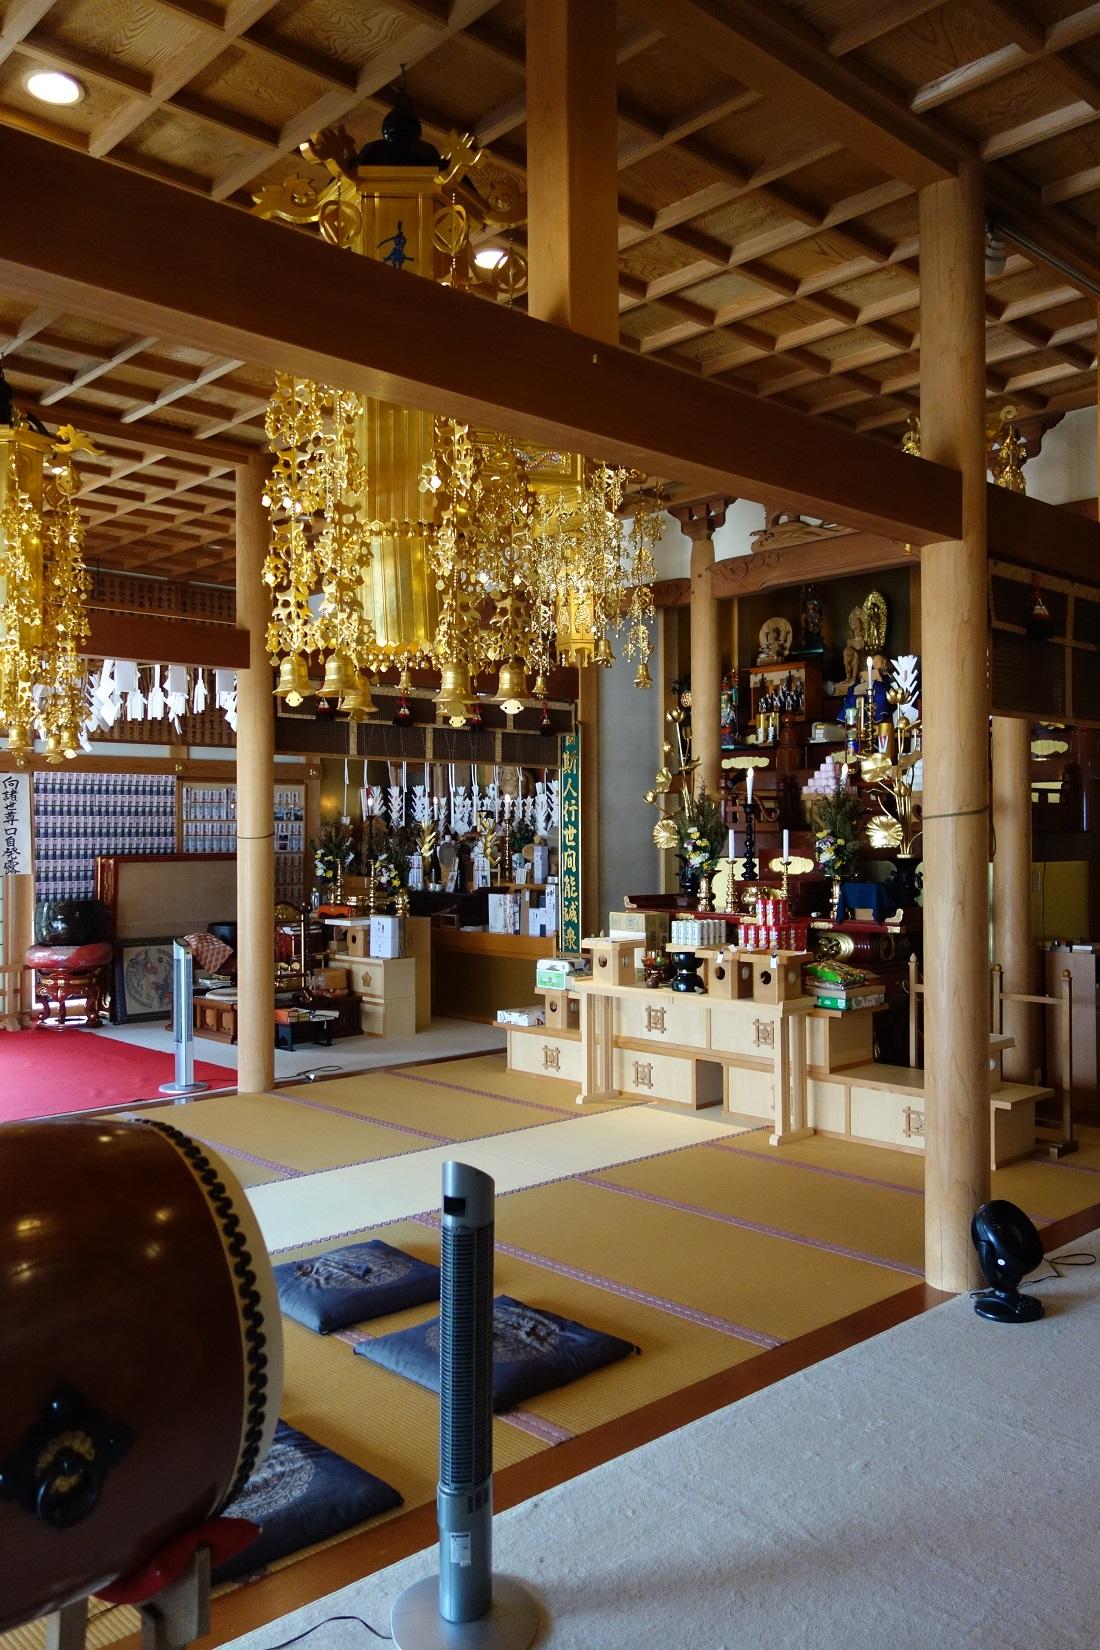 「TERA'S HOUSE(テラズハウス)  ~お寺で素敵な出会いを~」